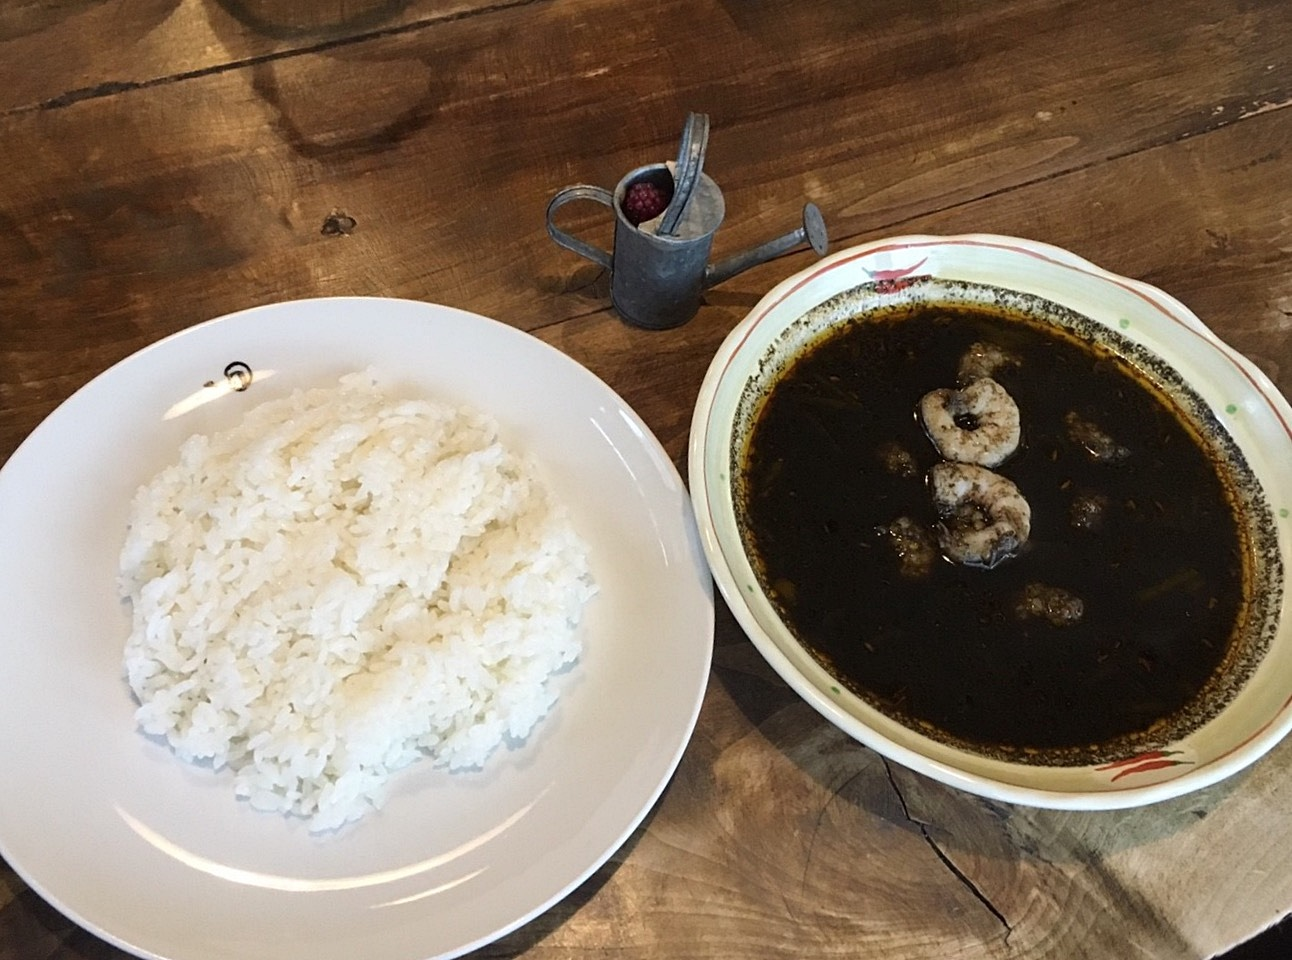 cafe jorro 黒カレー エビダブル(野菜ナシ)withライス.jpg